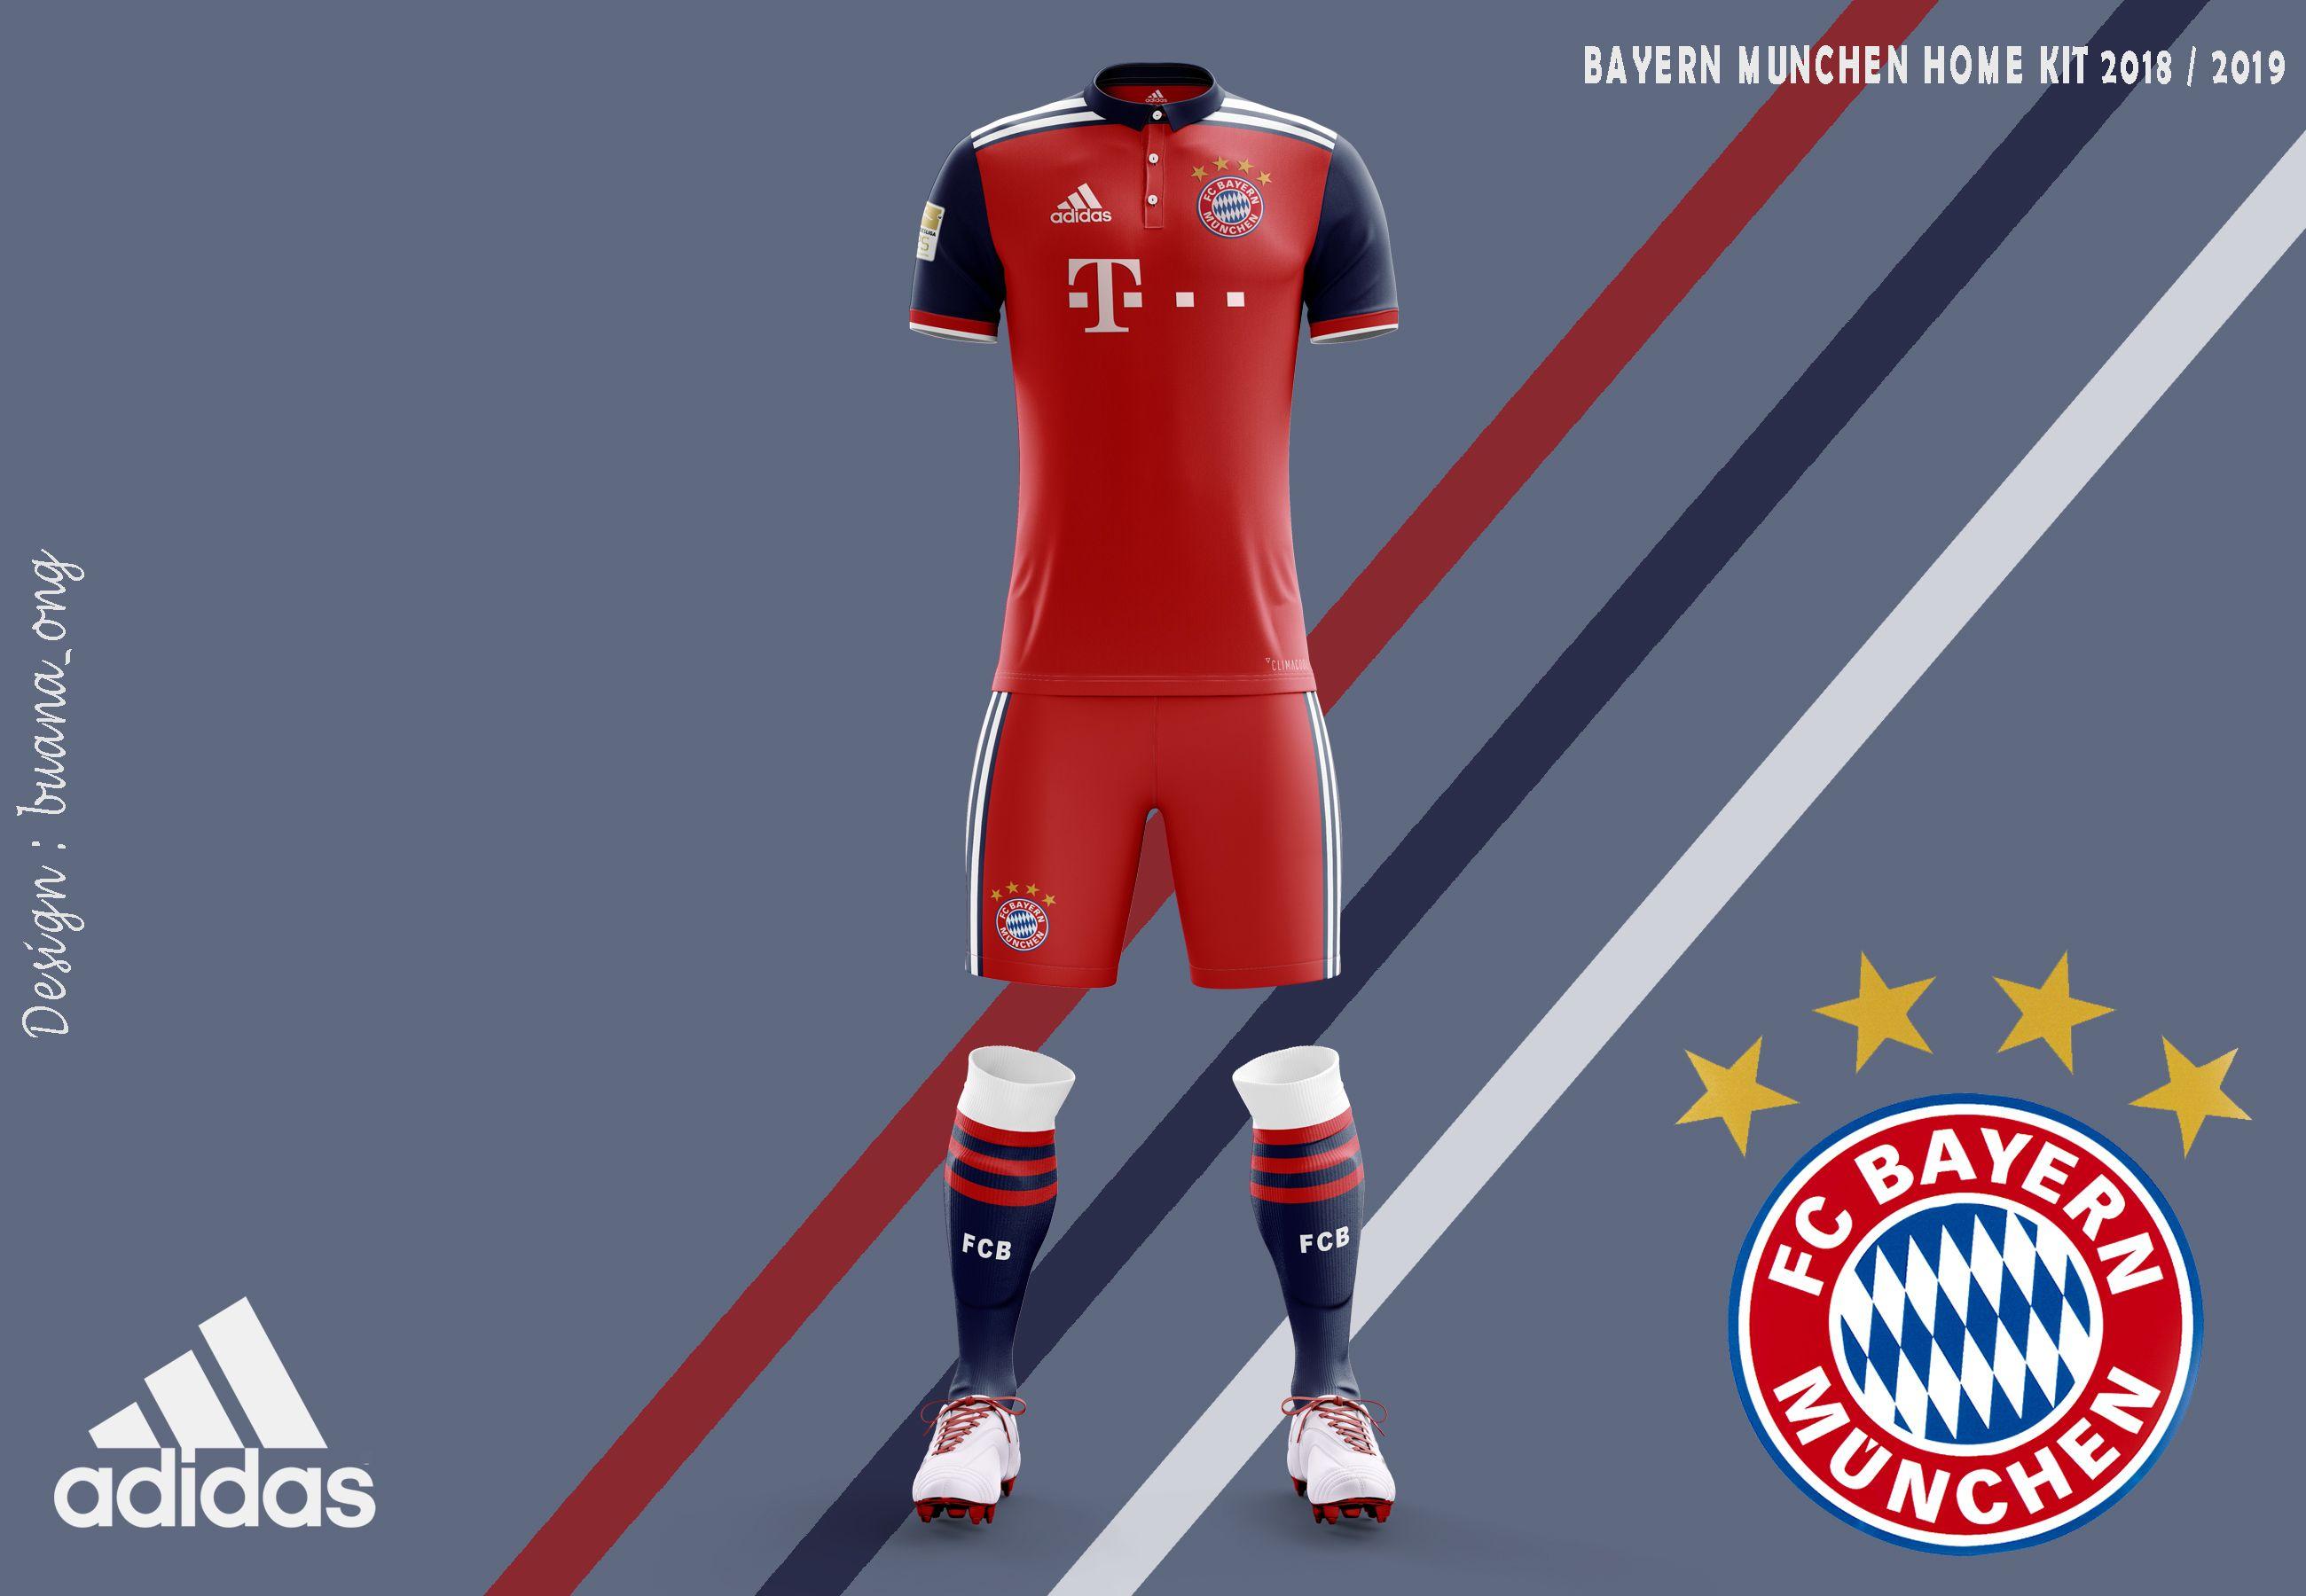 Check Out My Behance Project Bayern Munchen Concept Home Kit 2018 2019 Https Www Behance Net Gallery 60909829 B Sports Jersey Design Bayern Soccer Shirts